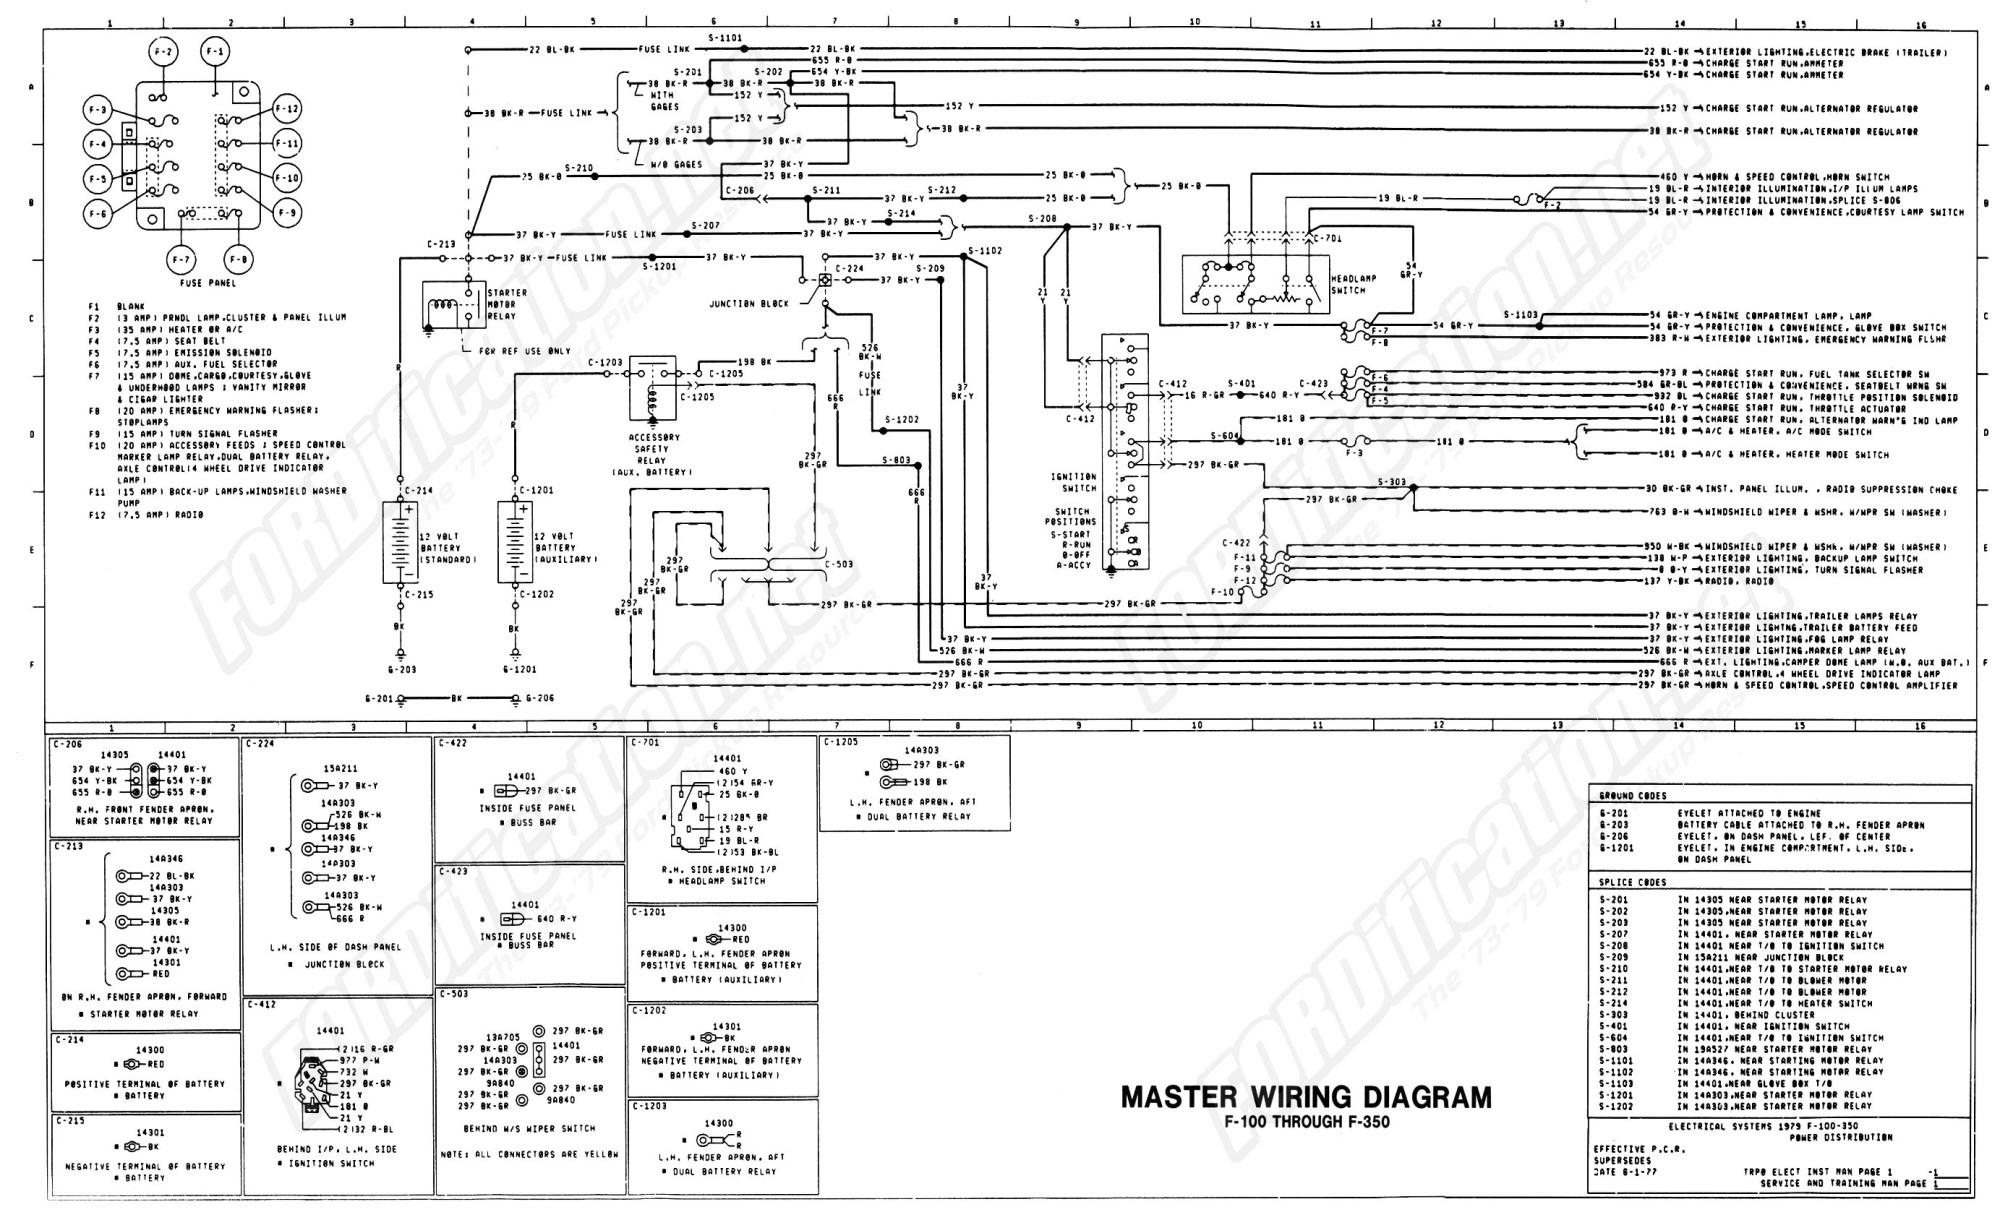 hight resolution of 1978 f150 charging wiring diagram basic wiring diagram u2022 rh rnetcomputer co 1978 ford f